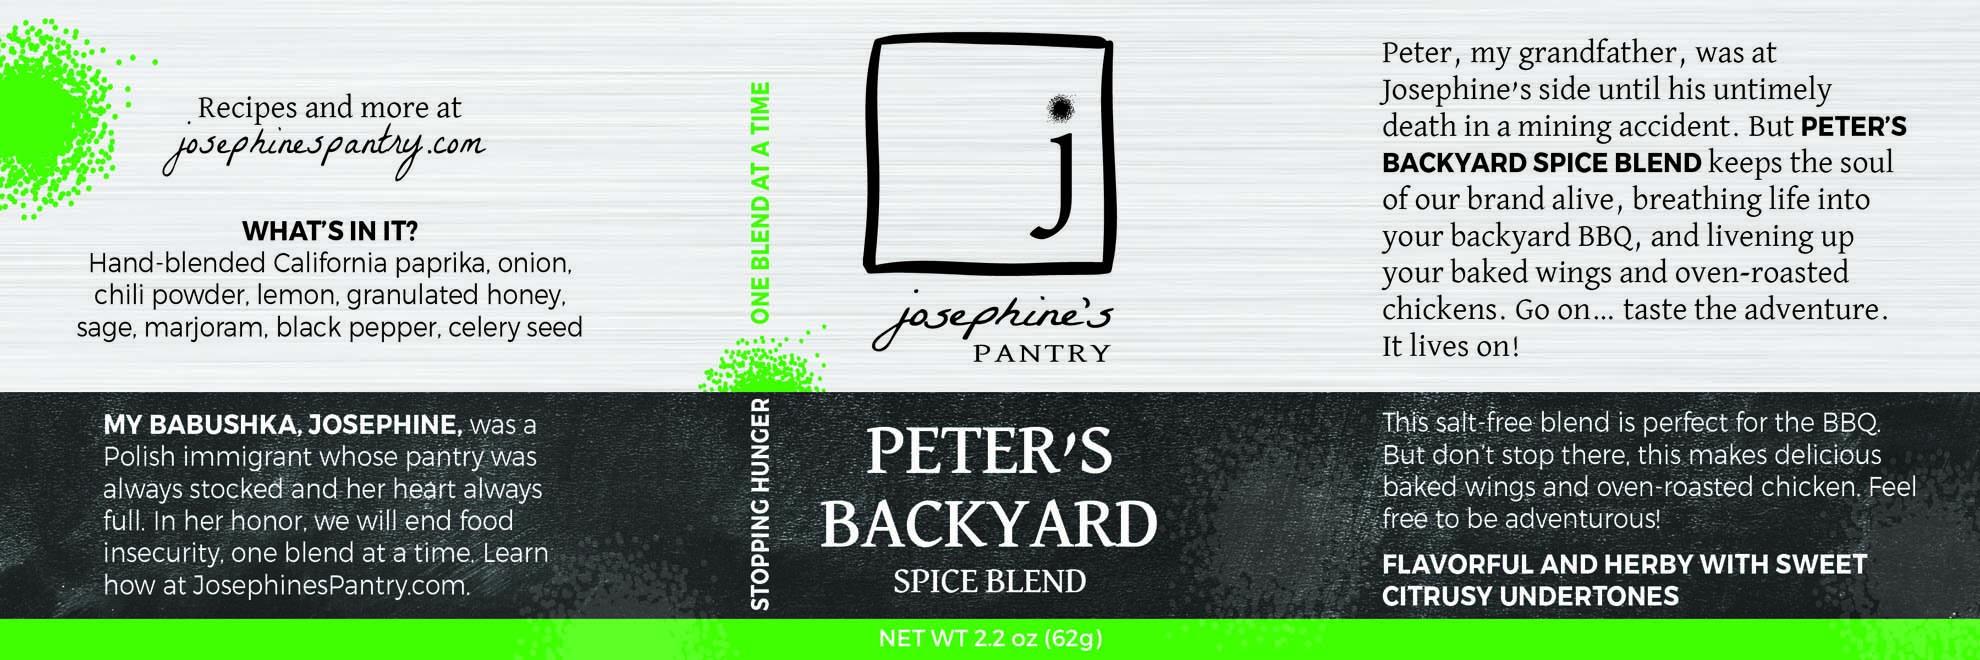 Josephines Pantry Peter's Backyard.jpg